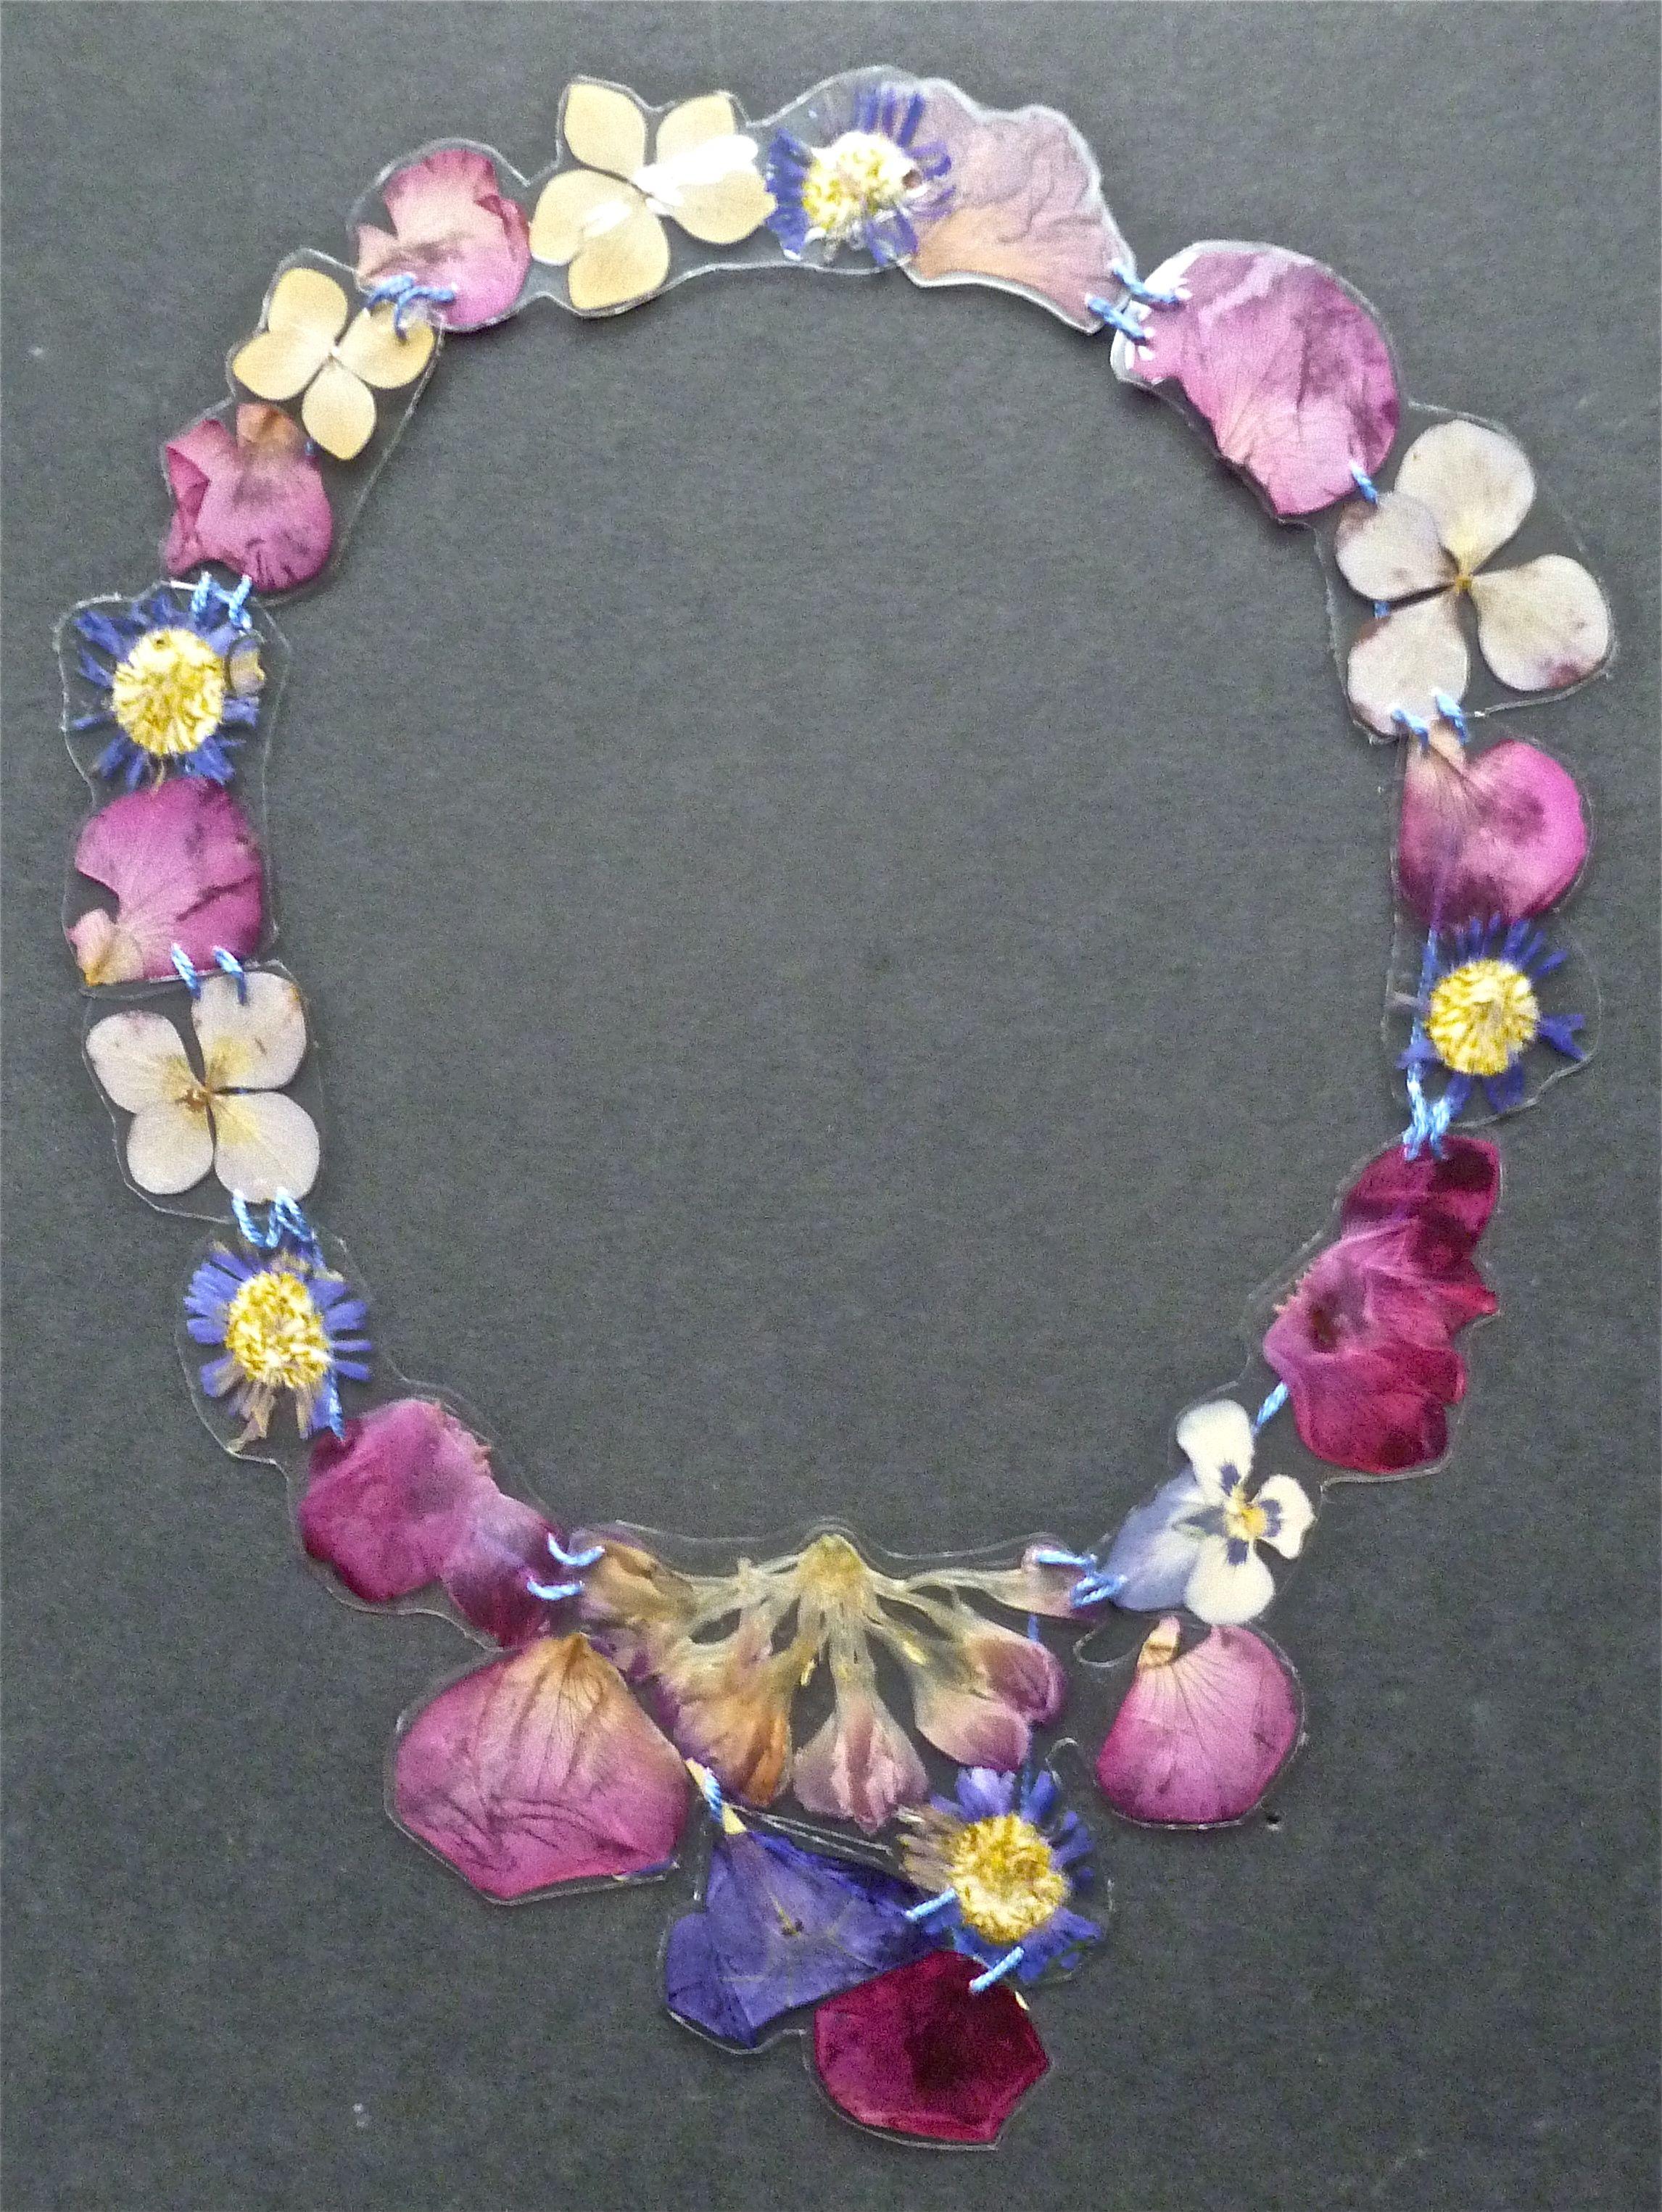 veronica guiduzzi, collana fiori plastificati e cuciti, 2012